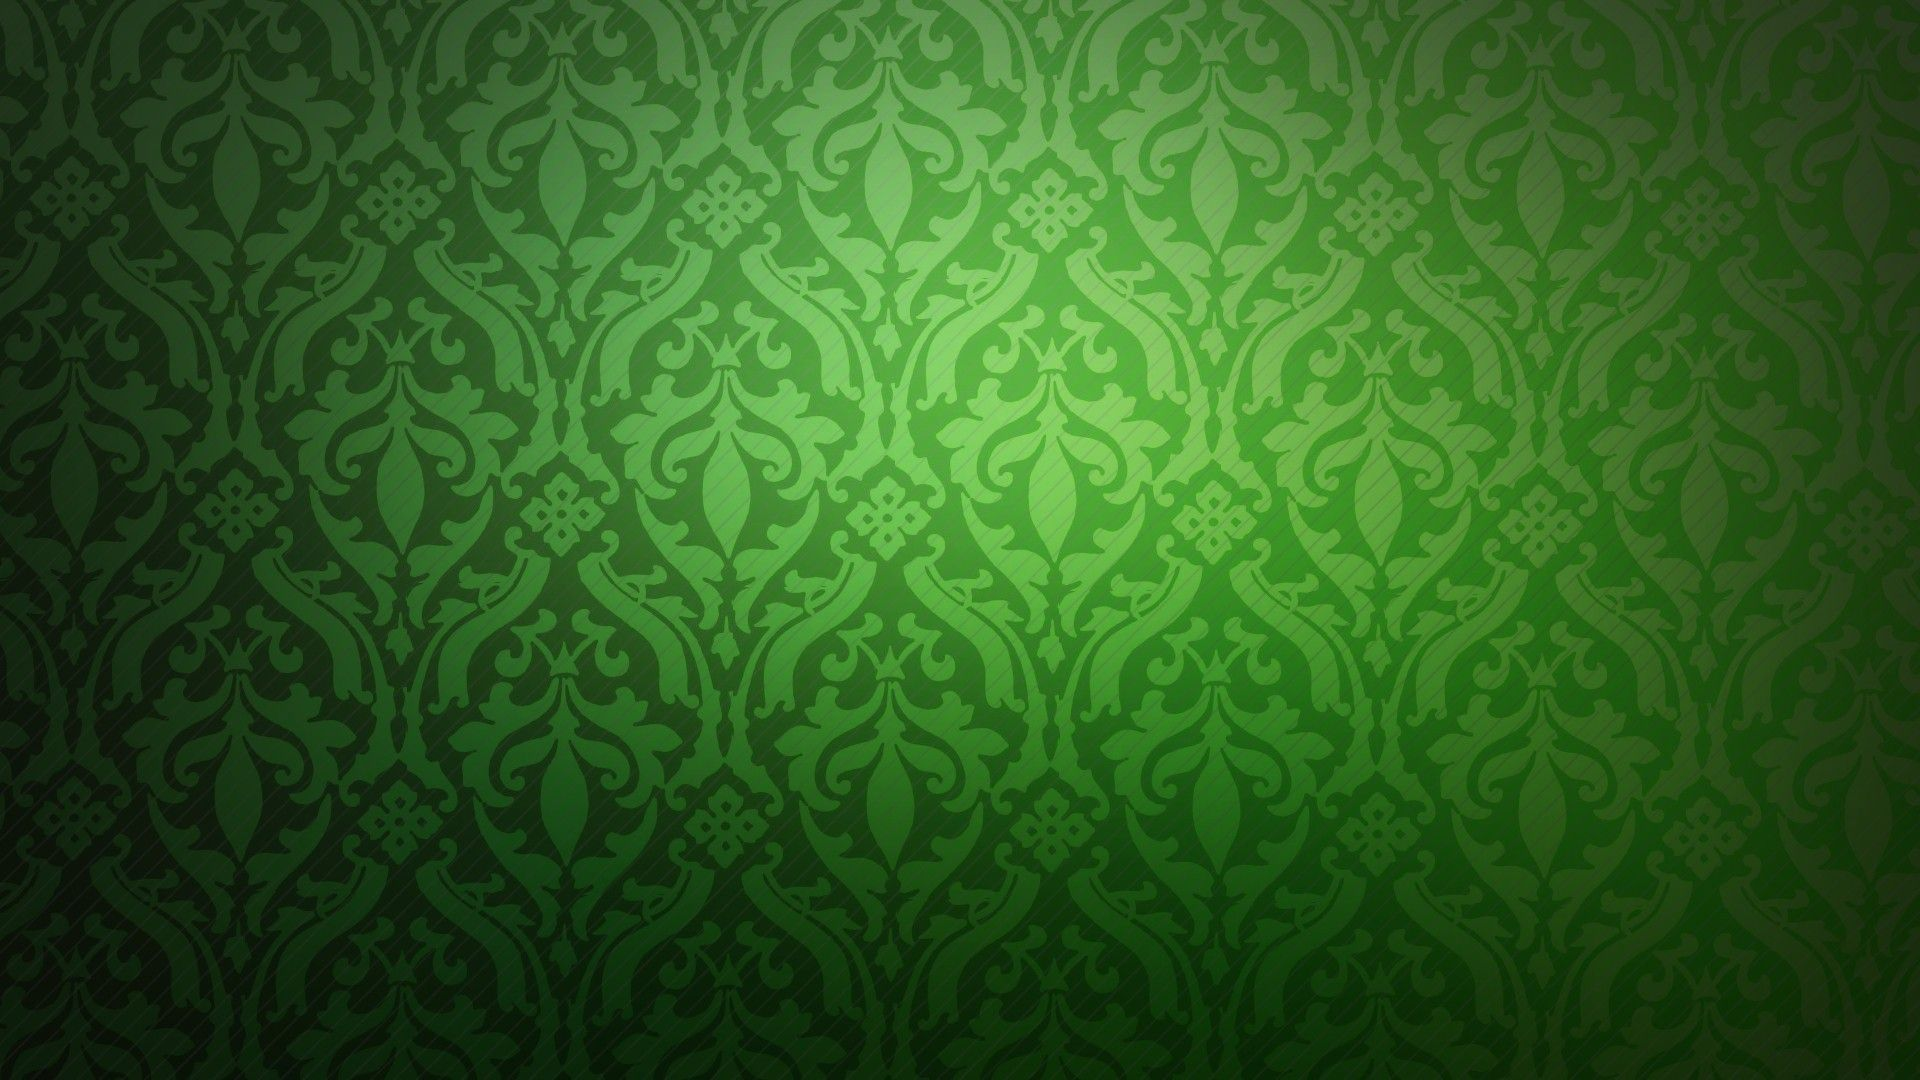 Desktop Wallpaper Dark Green Best Wallpaper Hd Green Wallpaper Green Backgrounds Vintage Wallpaper